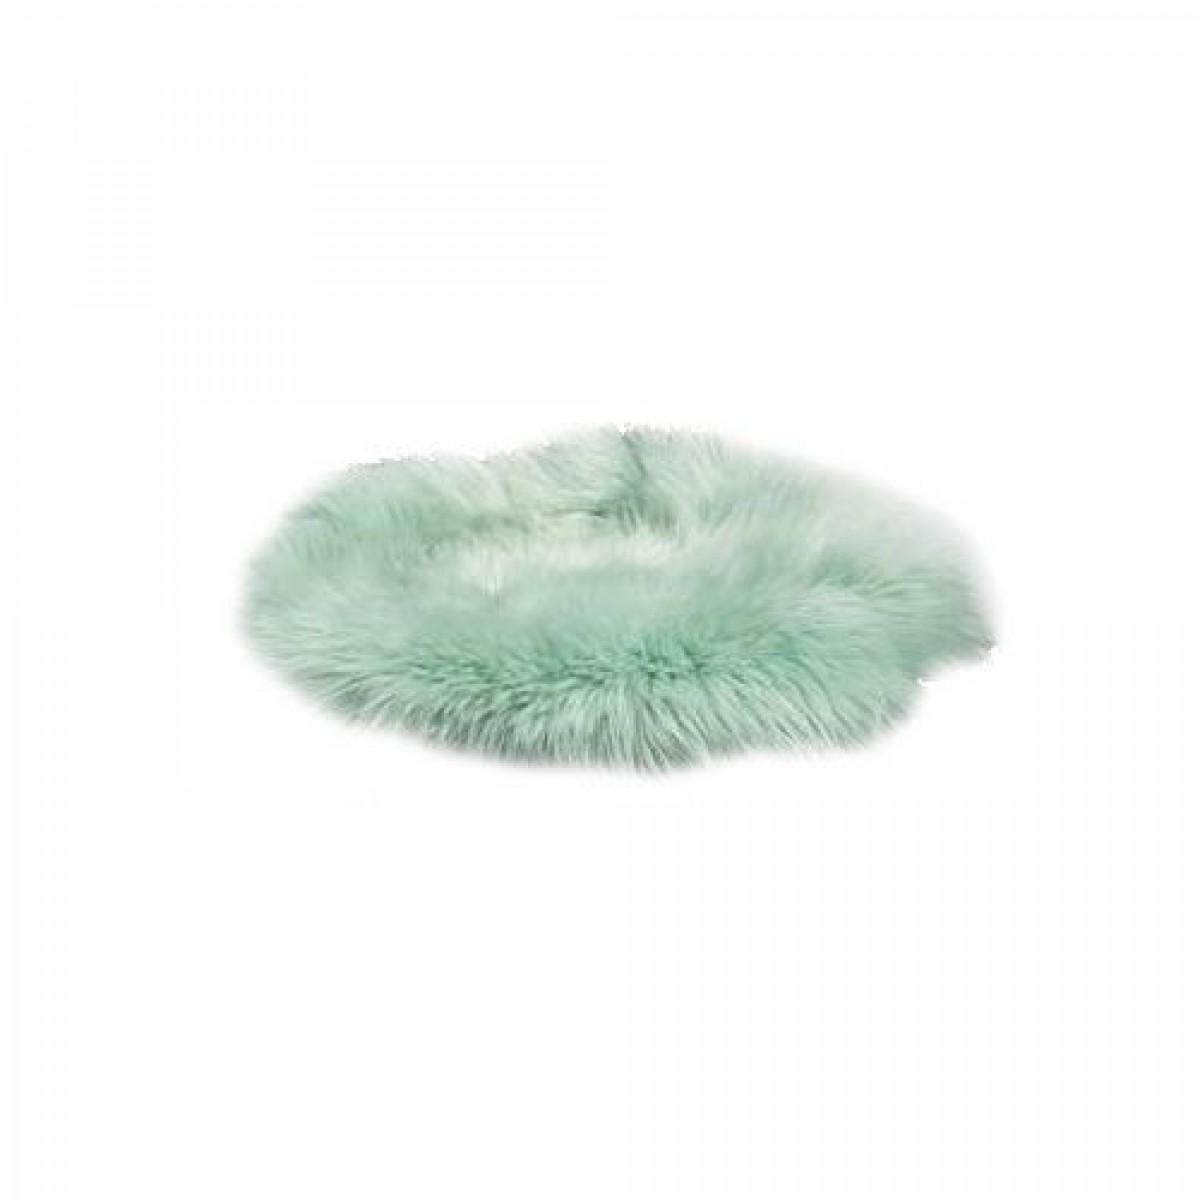 DACORE Sædehynde lammeskind lysegrøn rund ø 37 cm